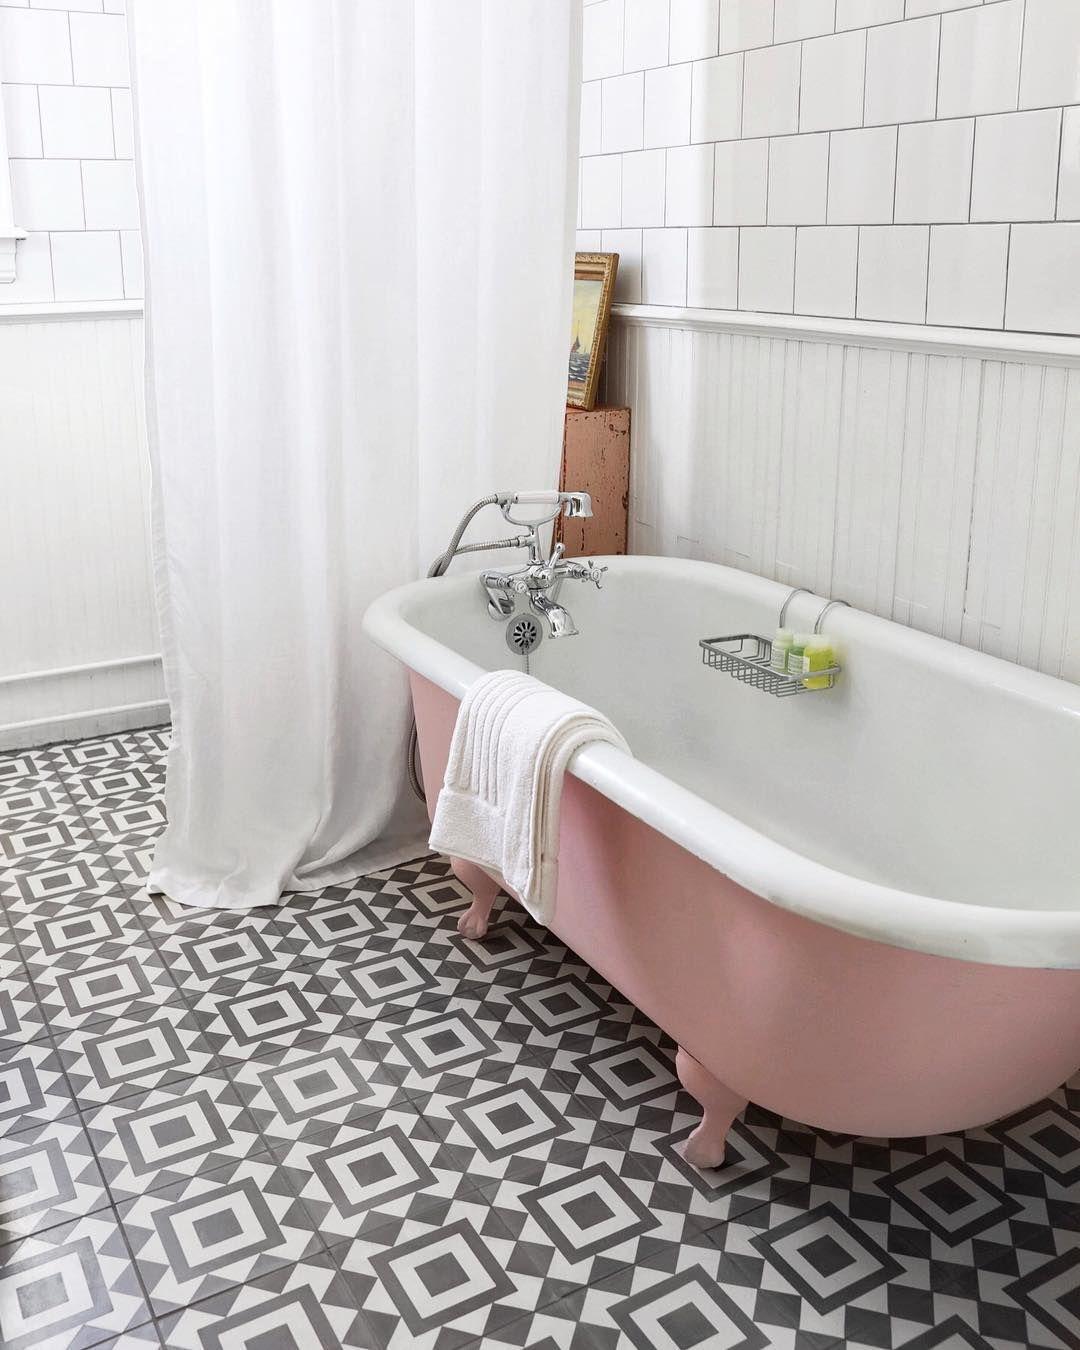 Deco Salle De Bain Sympa ~  pingl par victoria schneider sur ideas for main bath reno